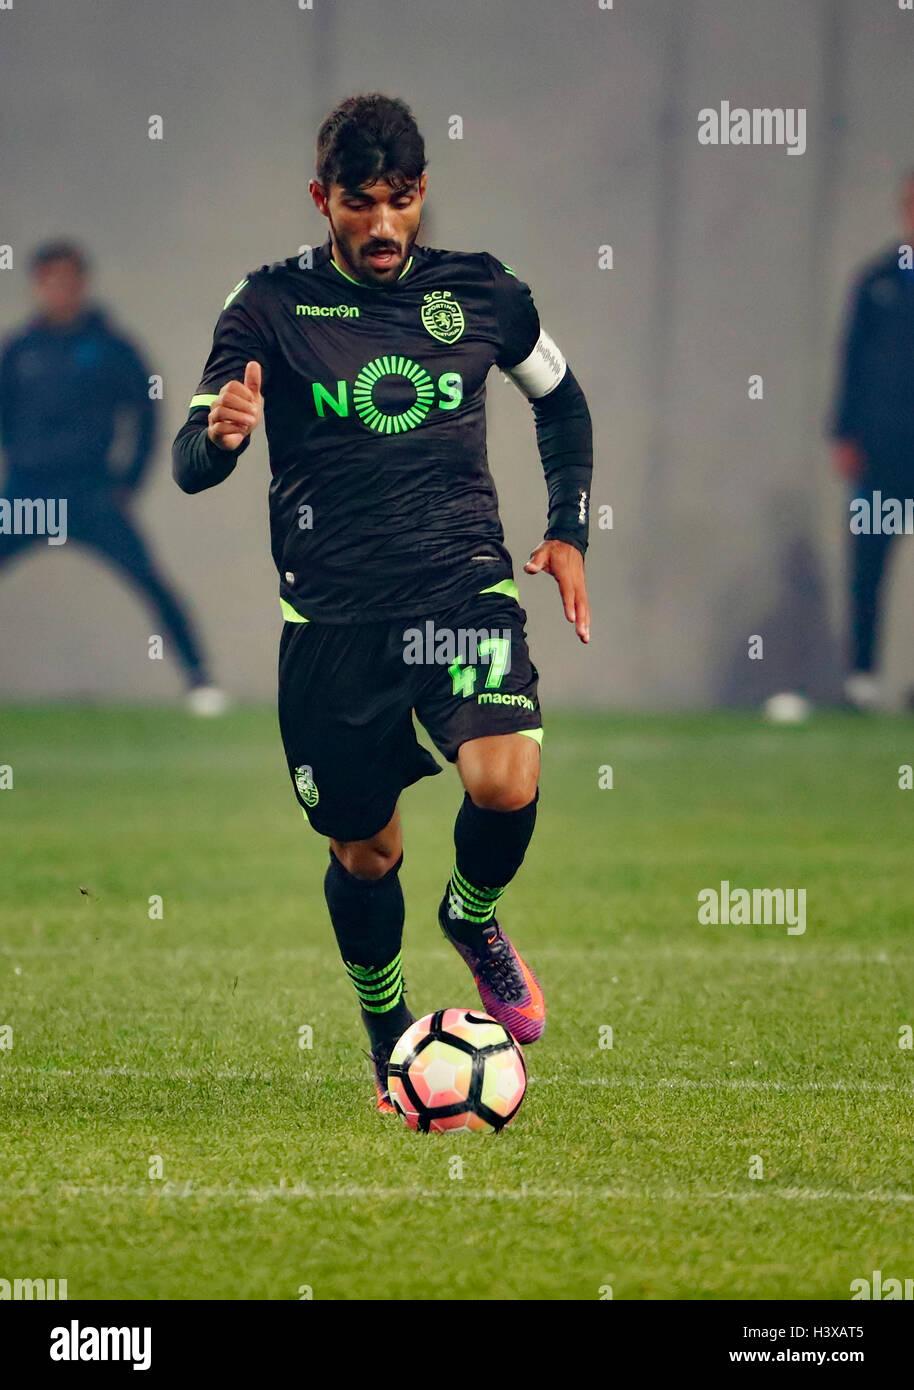 Budapest Hungary 13th Oct 2016 Ricardo Esgaio of Sporting CP